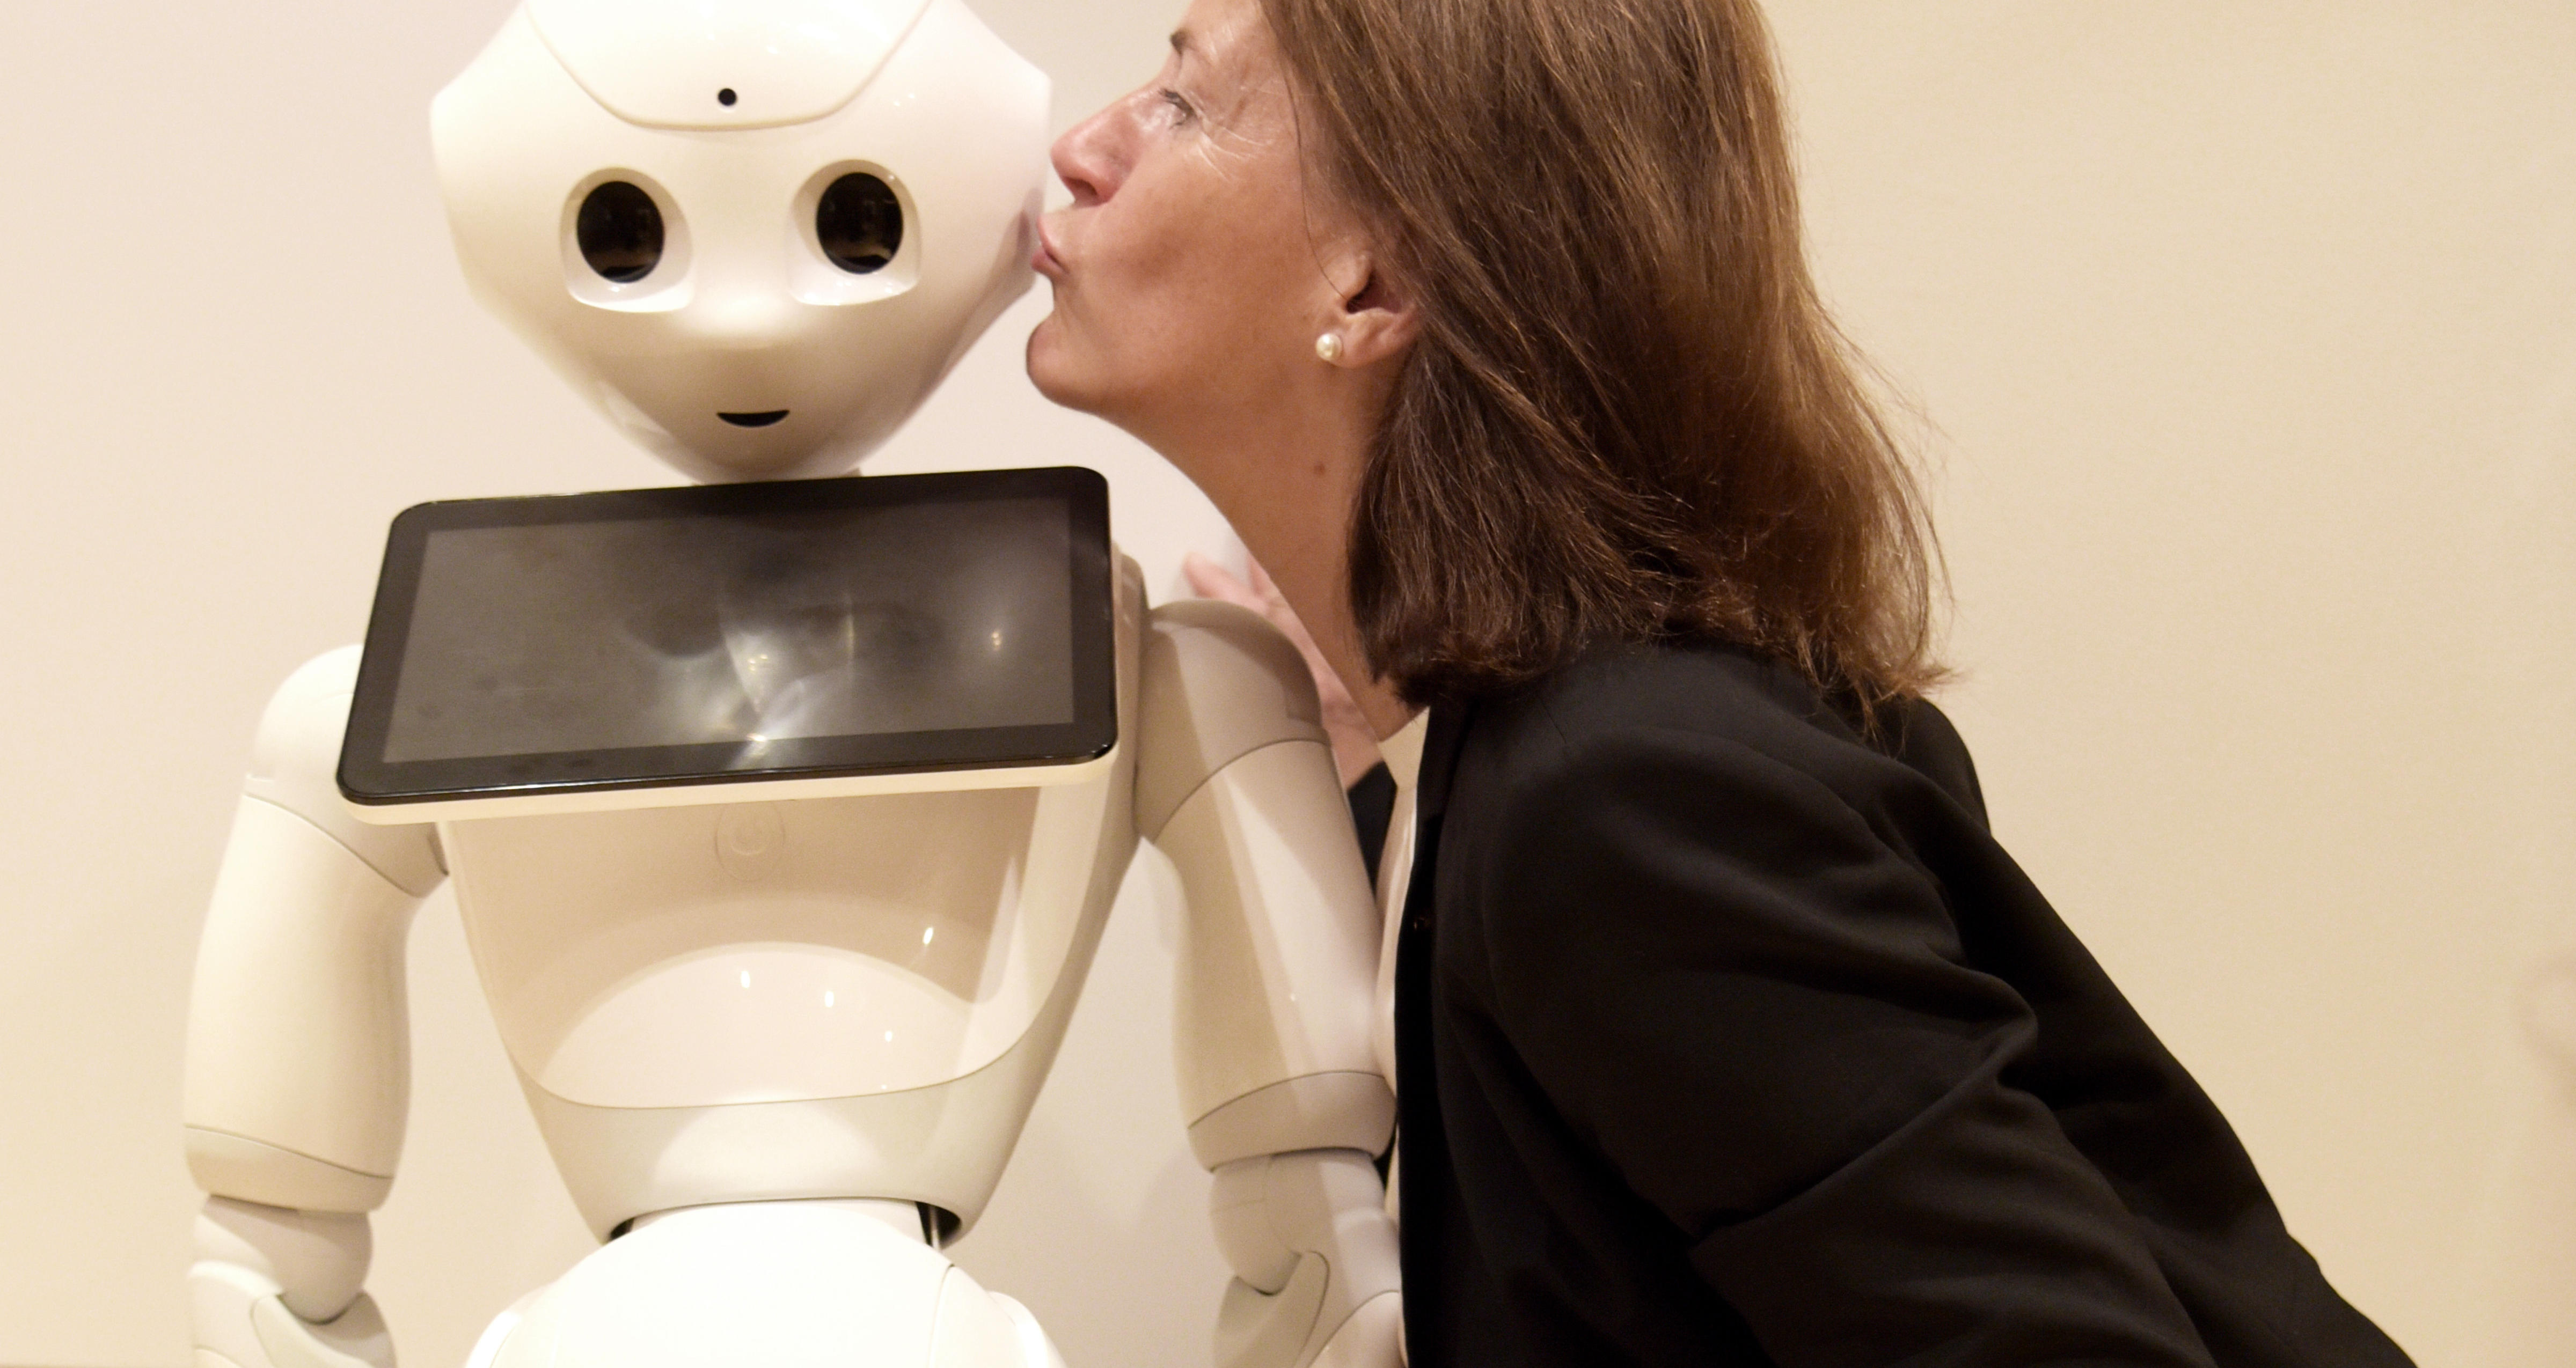 Bettina Husebø kisses the robot Pepper in Tokyo